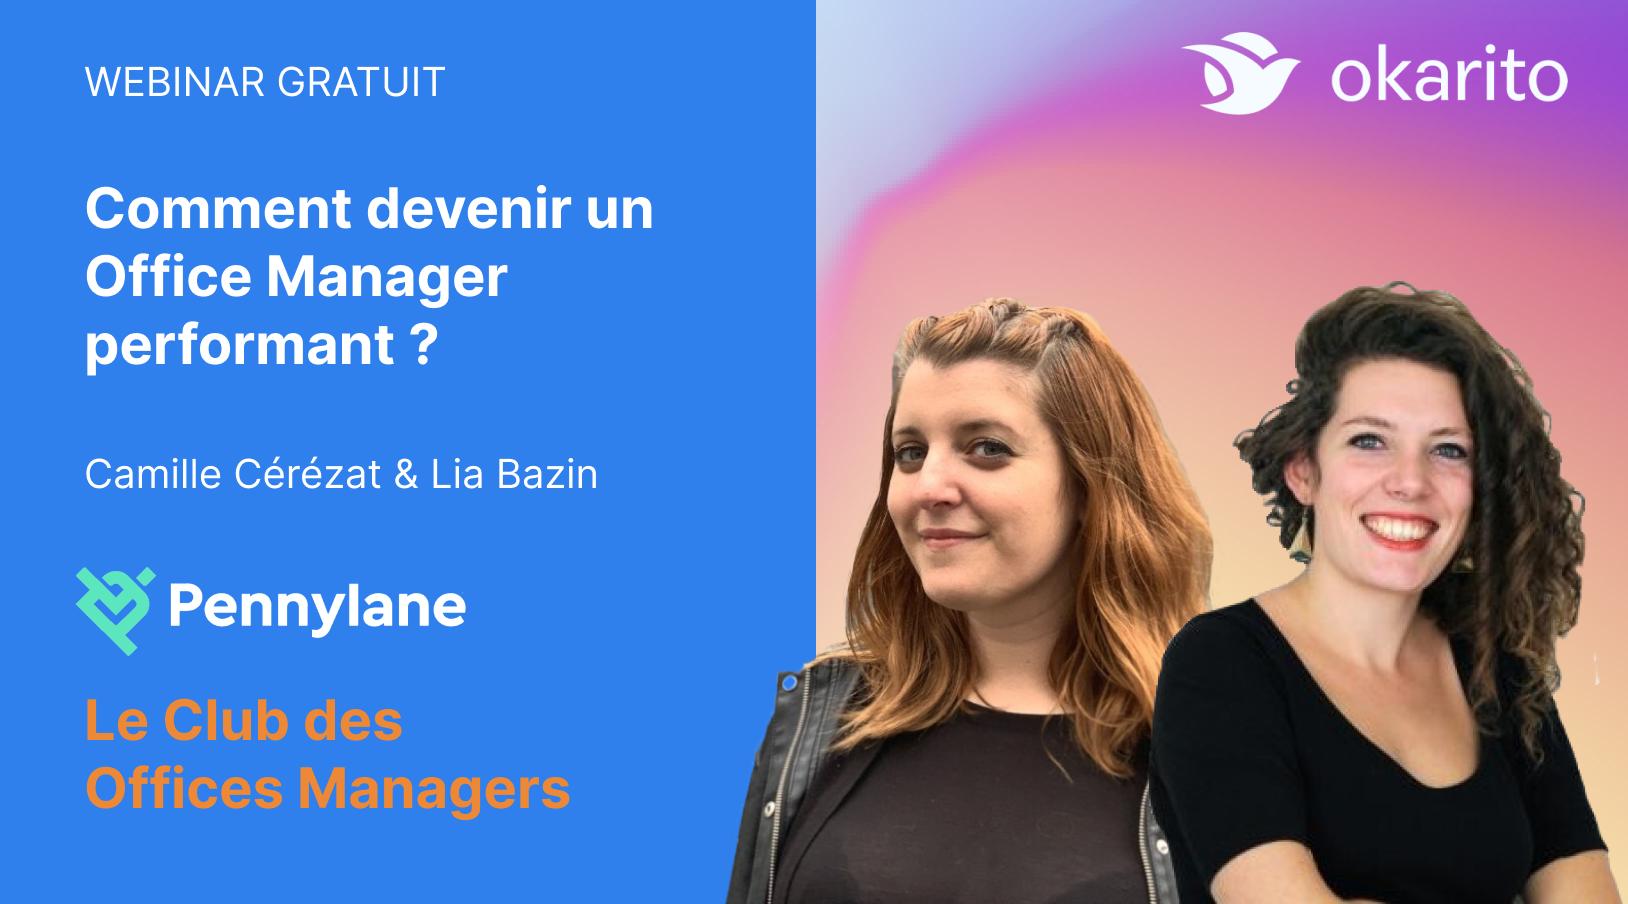 https://www.okarito.io/webinar/comment-devenir-un-office-manager-performant?utm_medium=article&utm_source=office&utm_campaign=manager&utm_term=metier